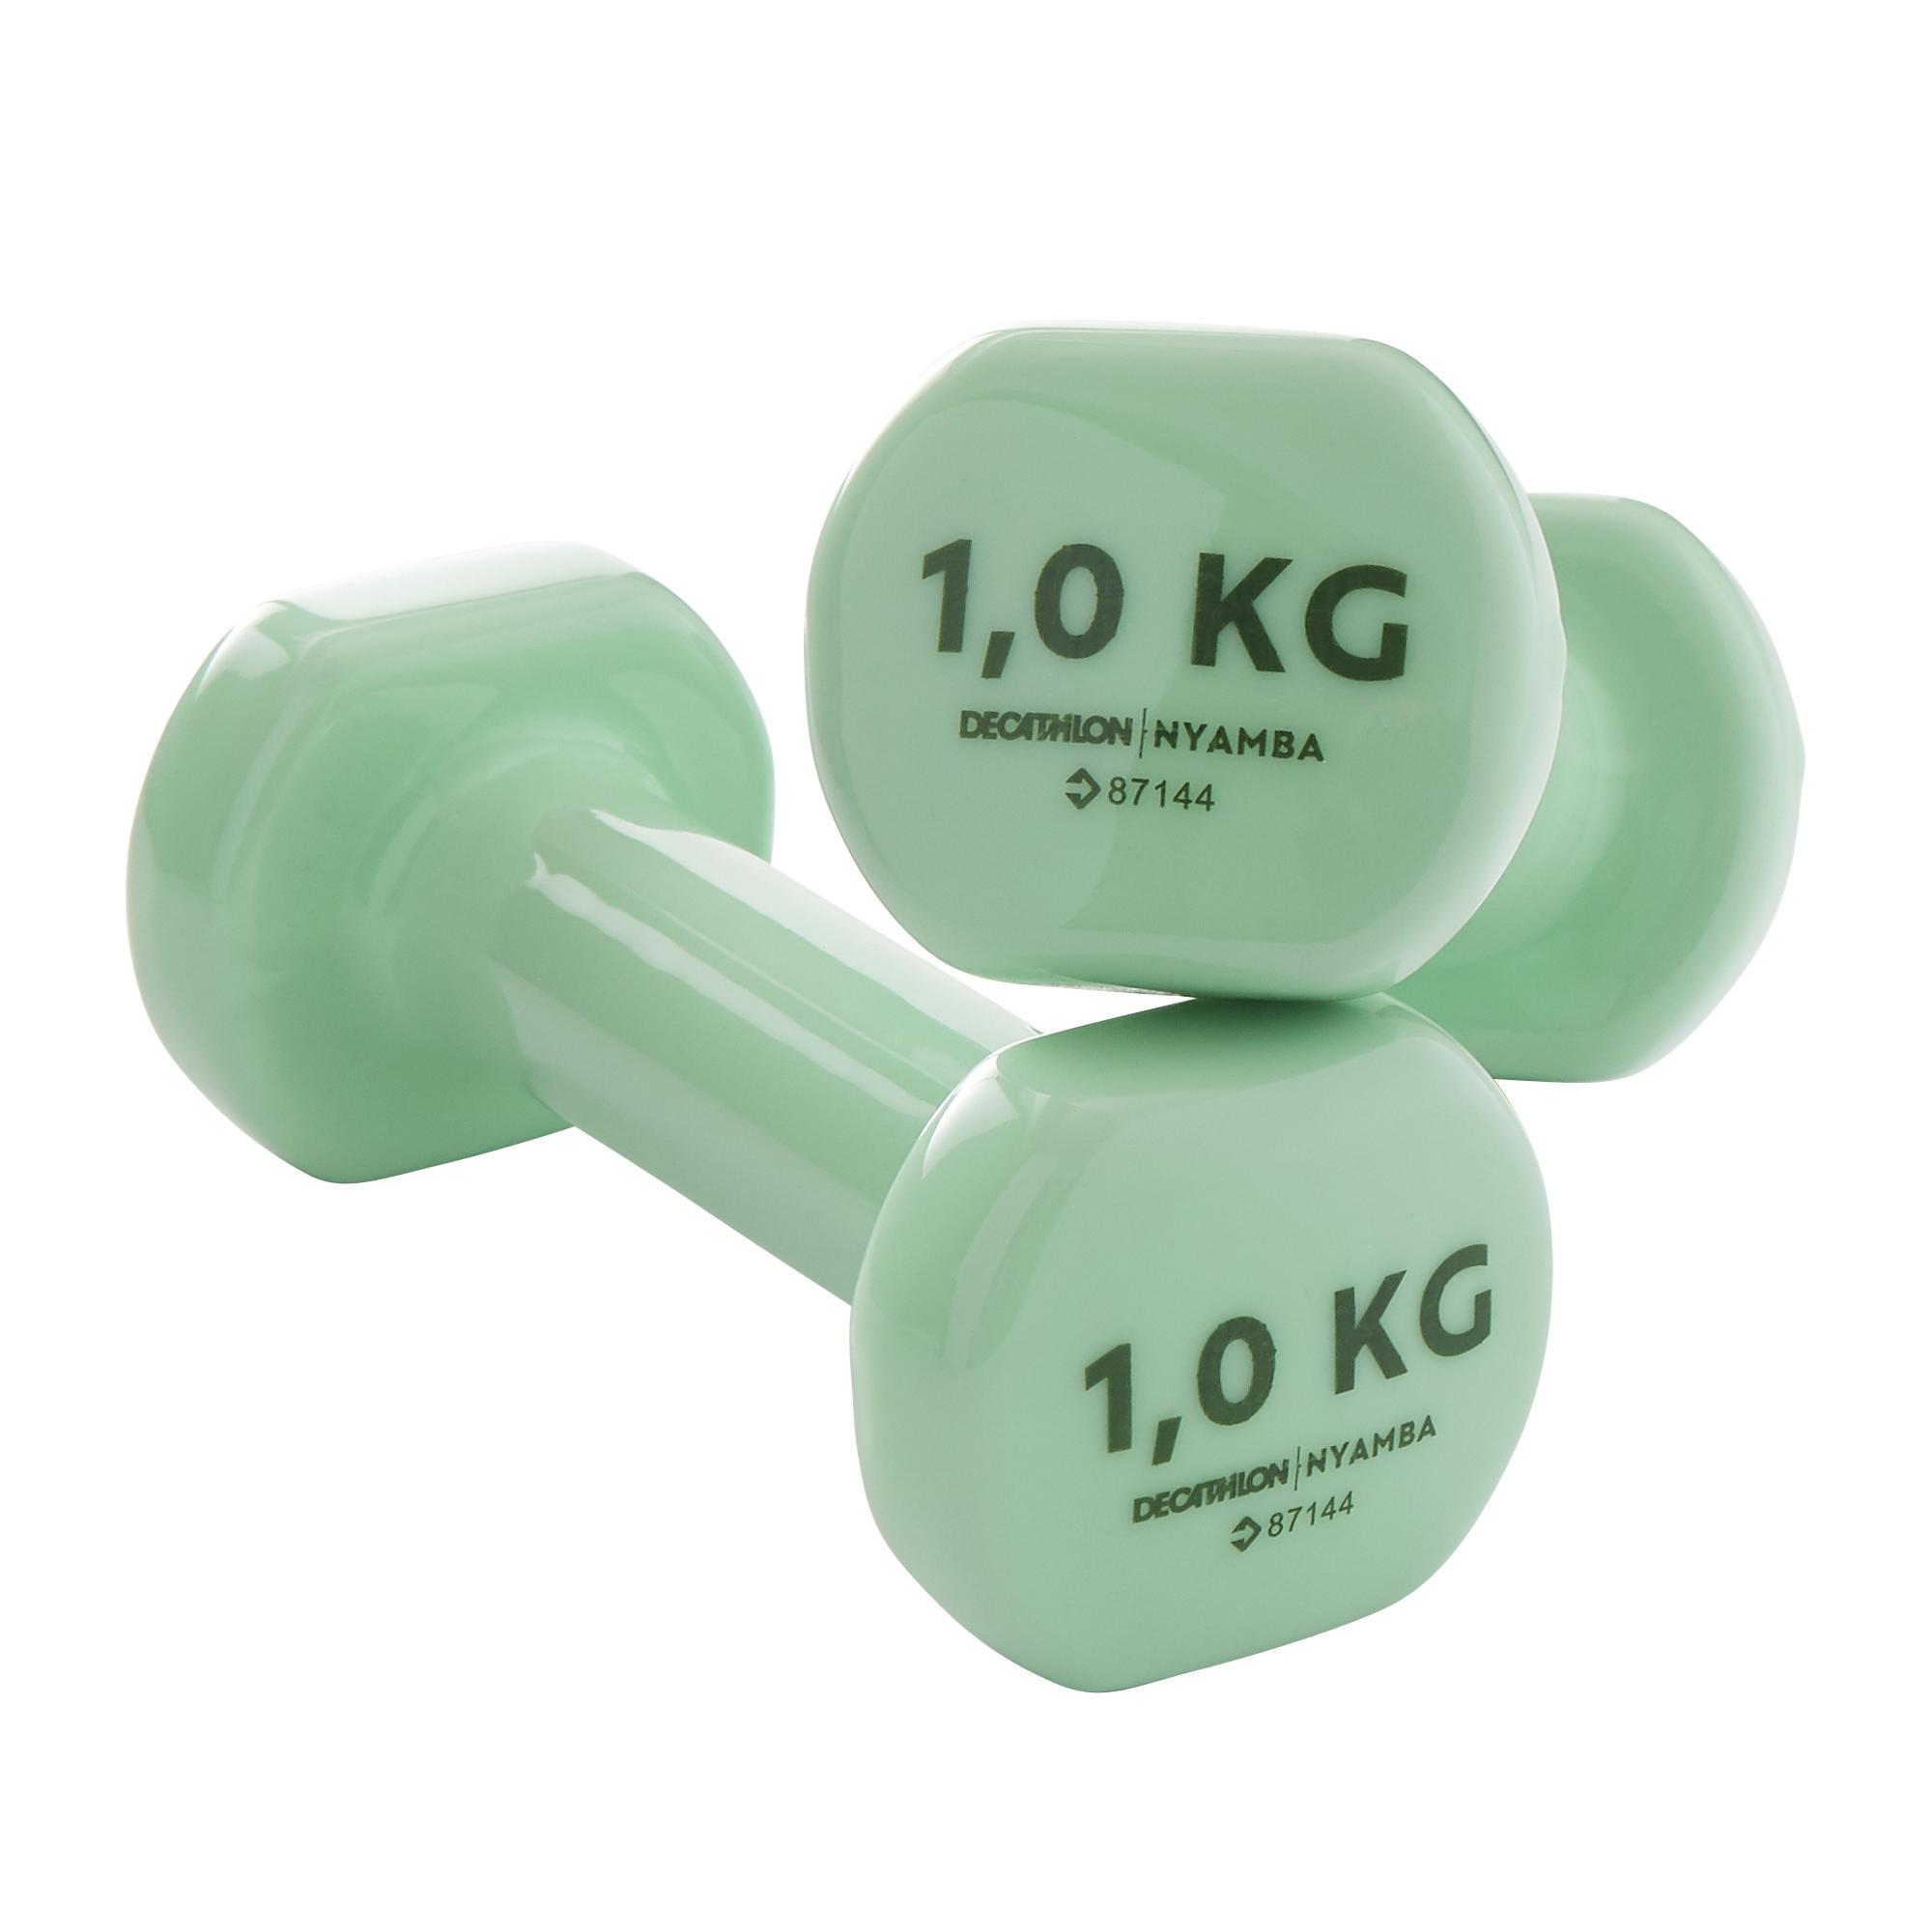 nyamba manubri pvc 2*1 kg verdi